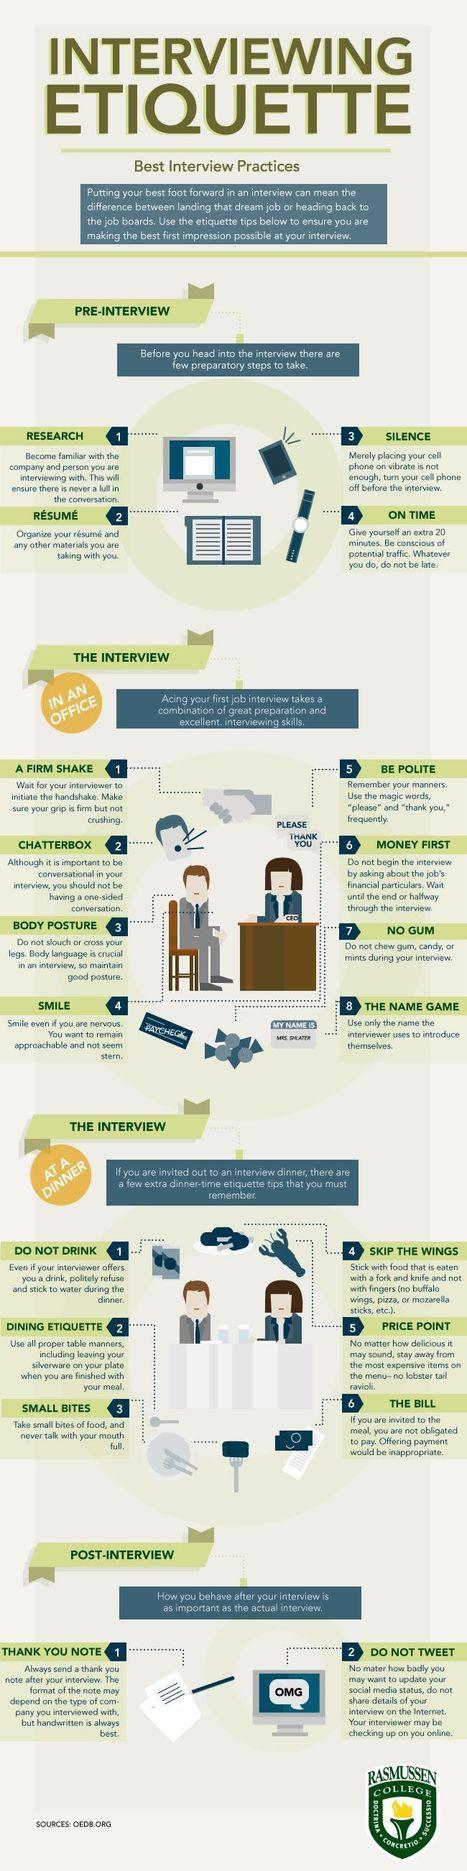 Interview Etiquette advice | Interview Advice & Tips | Scoop.it